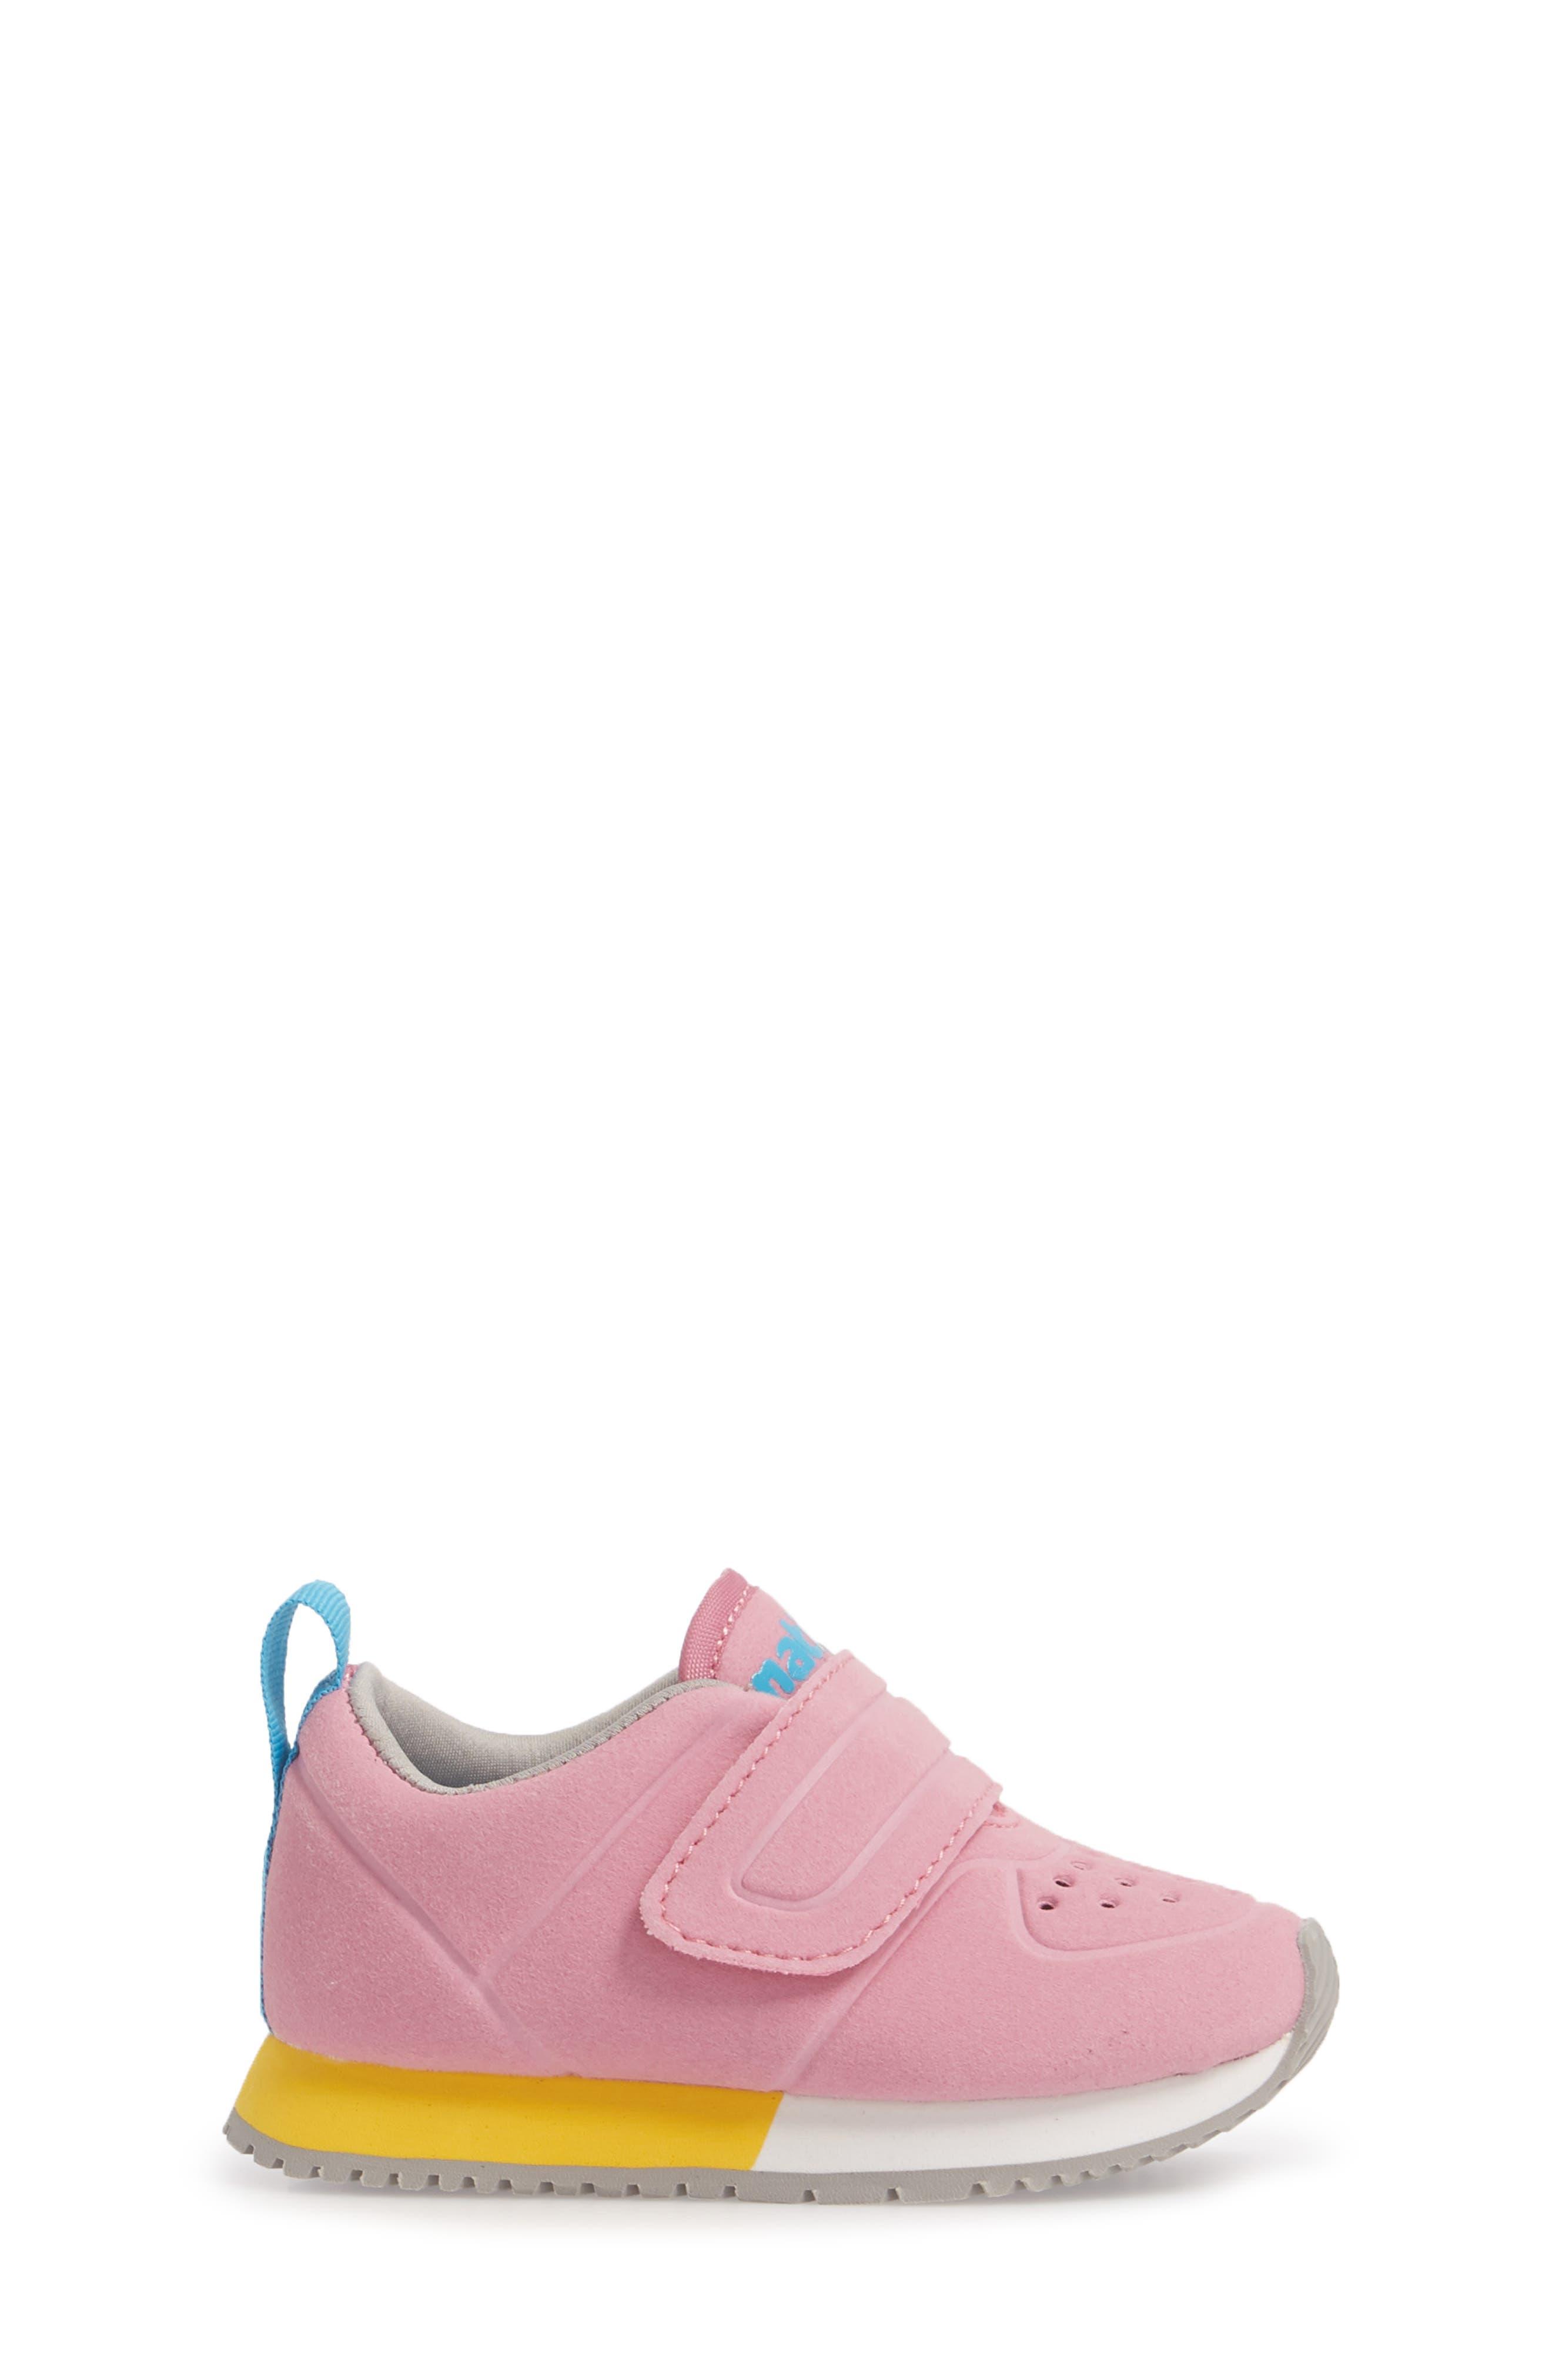 Native Cornell Perforated Sneaker,                             Alternate thumbnail 3, color,                             Malibu Pink/ White/ Blue